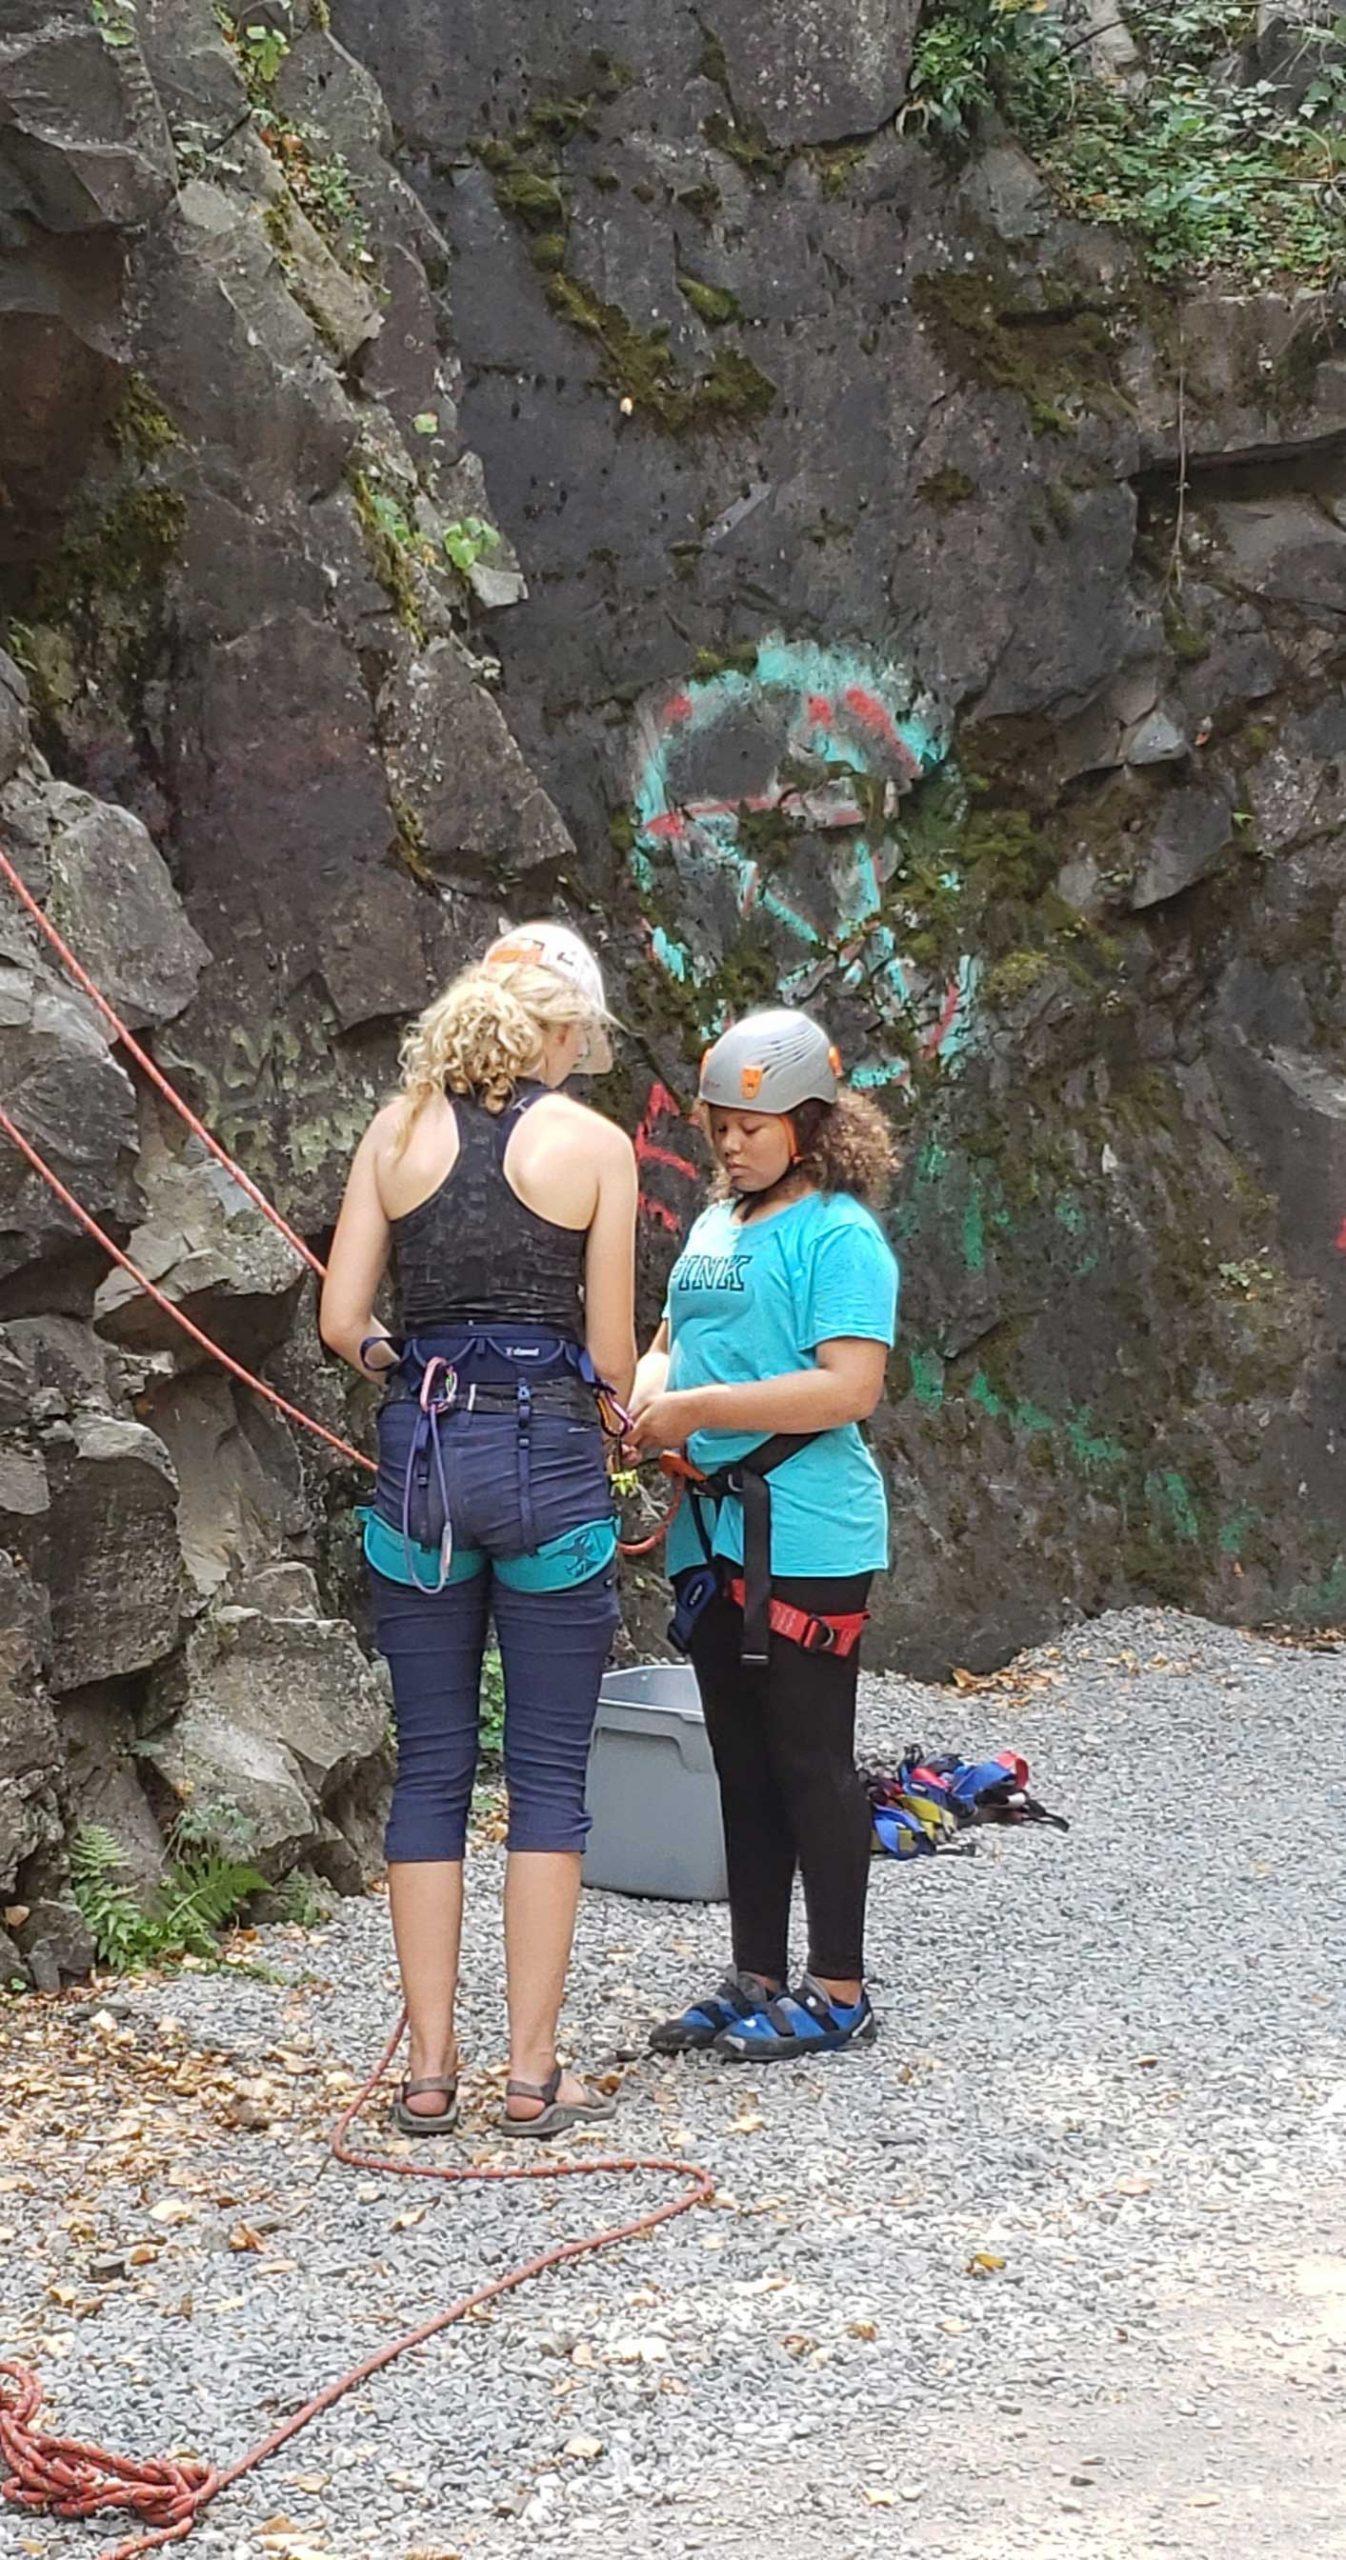 Climbing20212-web-rez